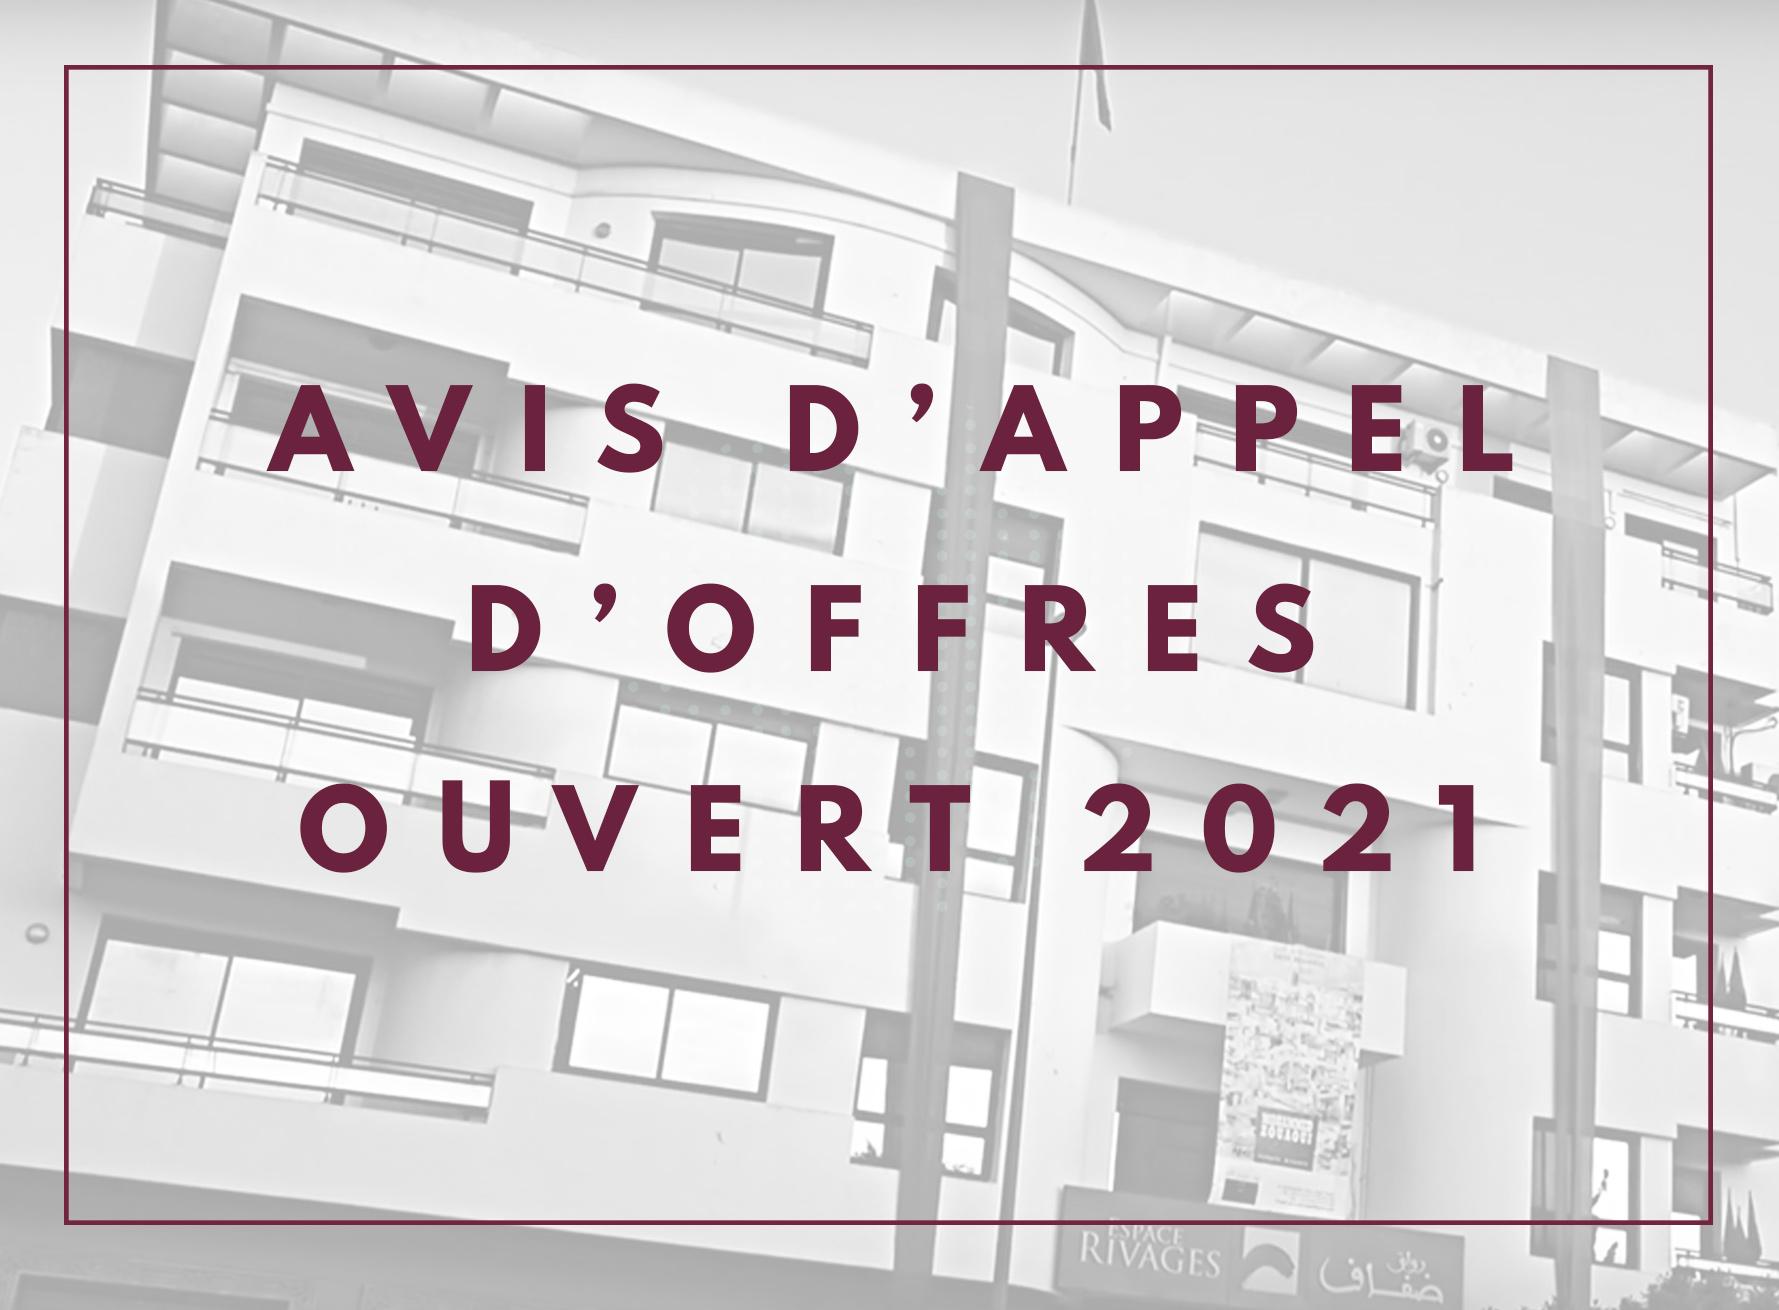 Avis d'appel d'offred ouvert n°01/2021/KENET/2